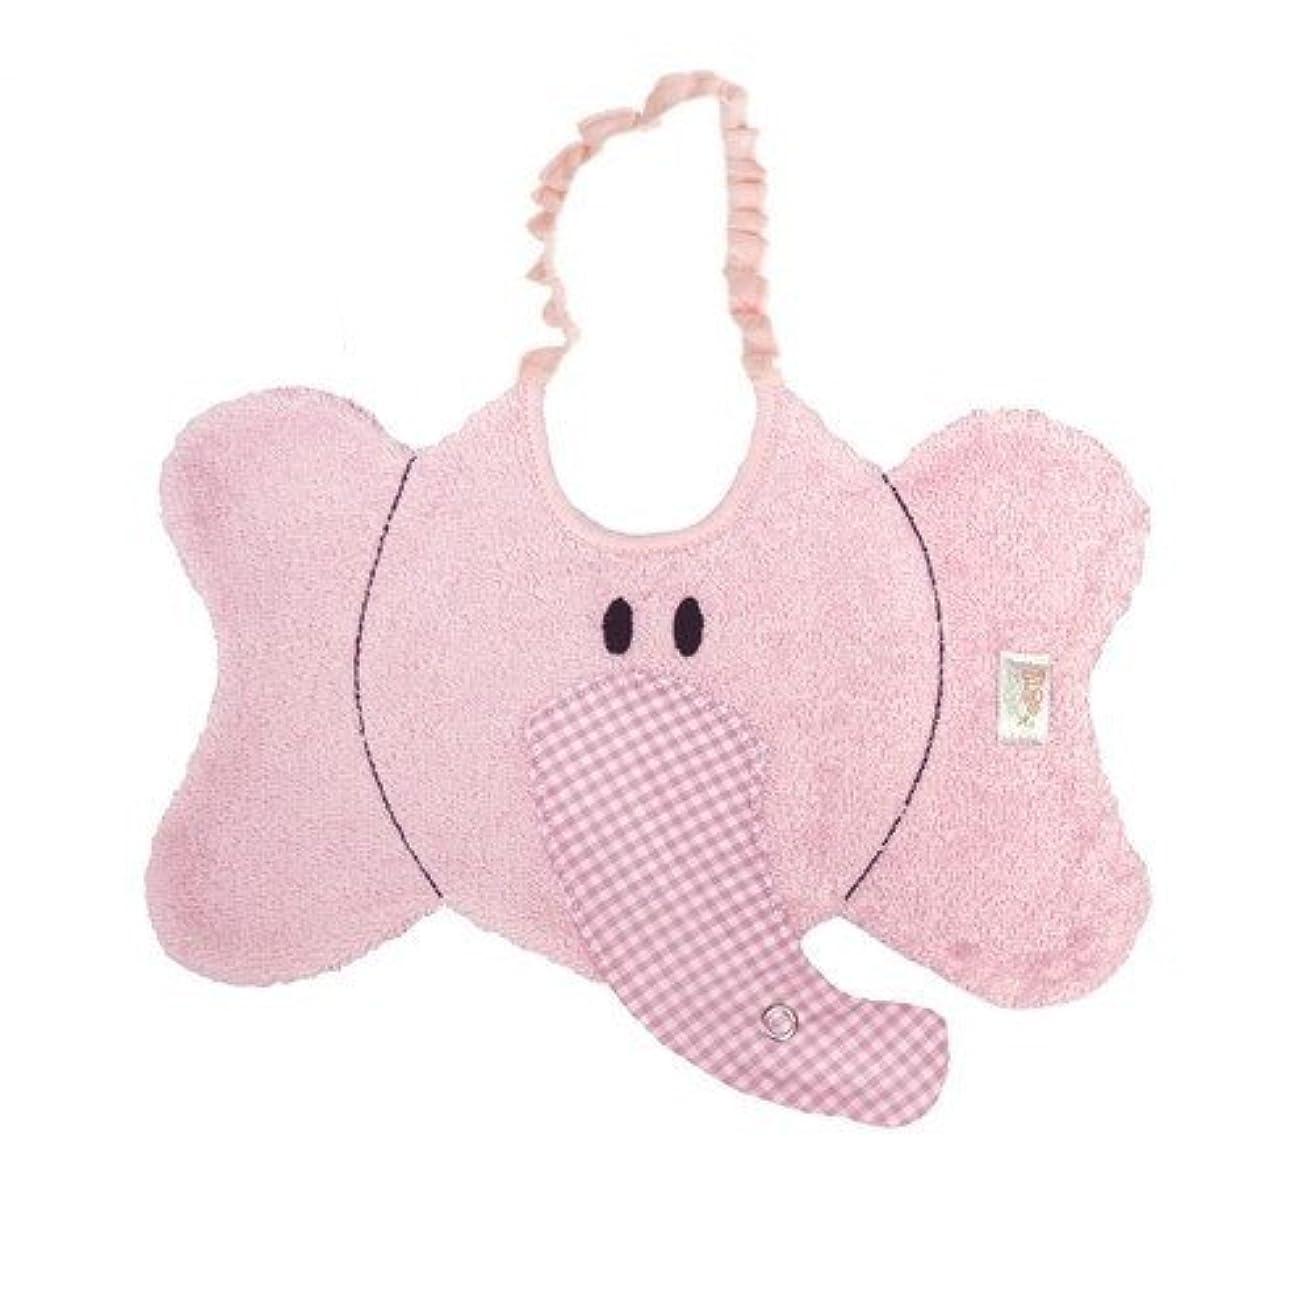 Zigozago - Baby Bib ELEPHANT with dummy pacifier chain - Tie: Elastic - One Size - Color: Pink